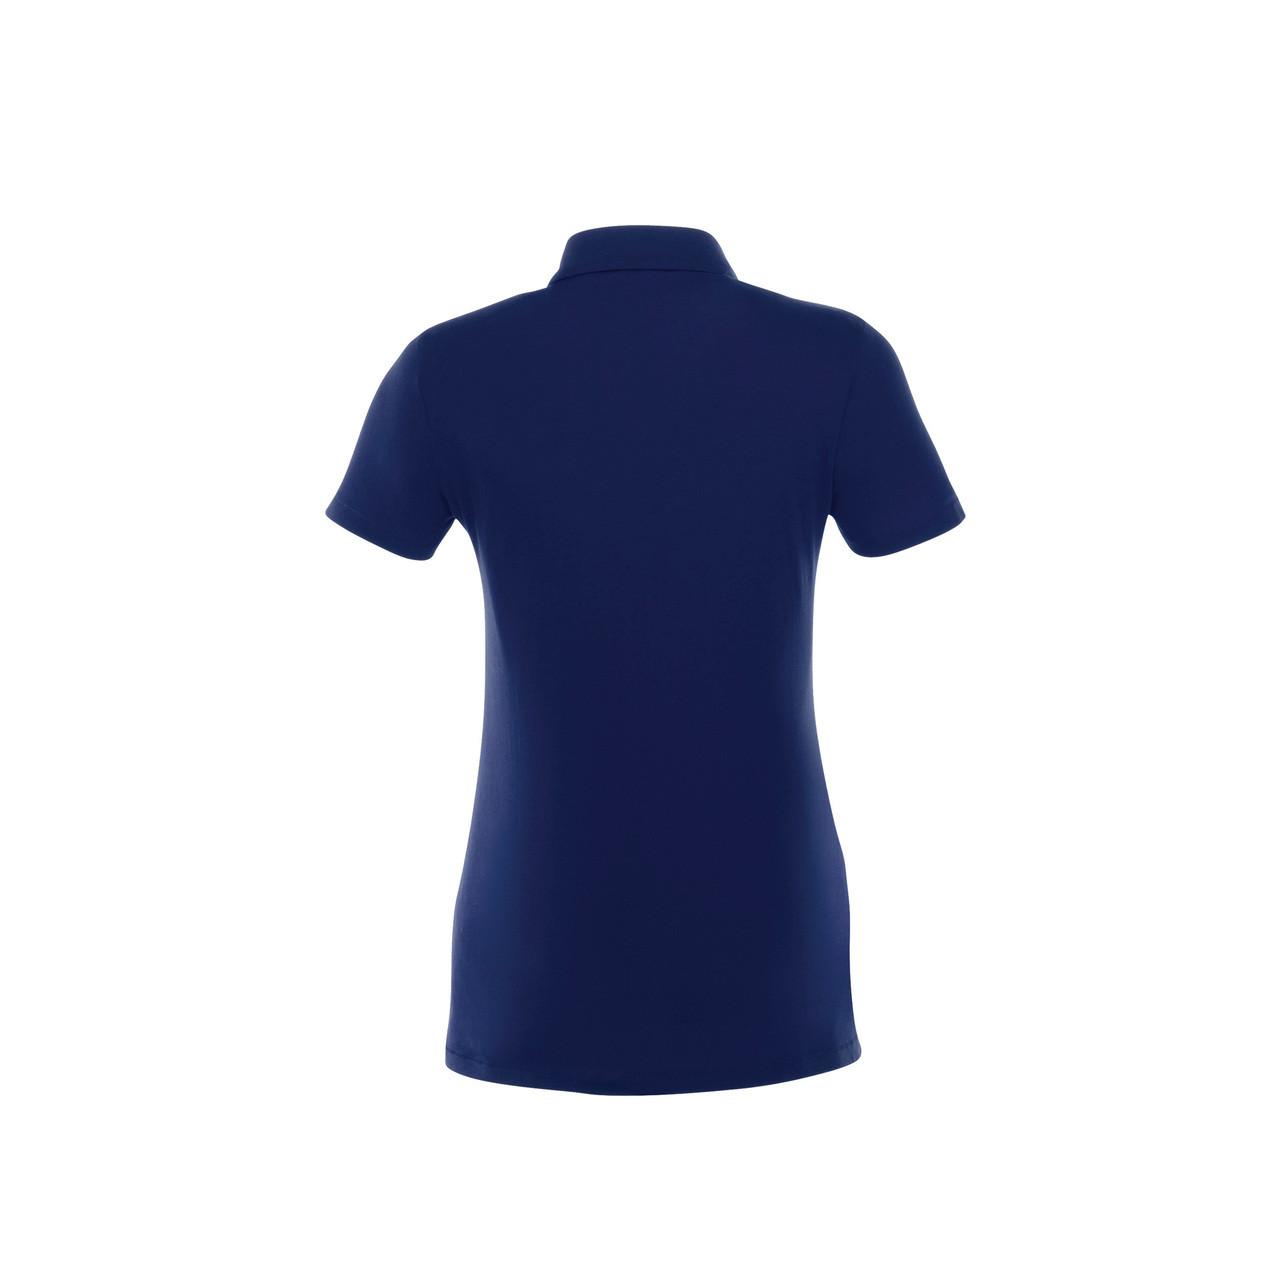 navy blue polo shirt back